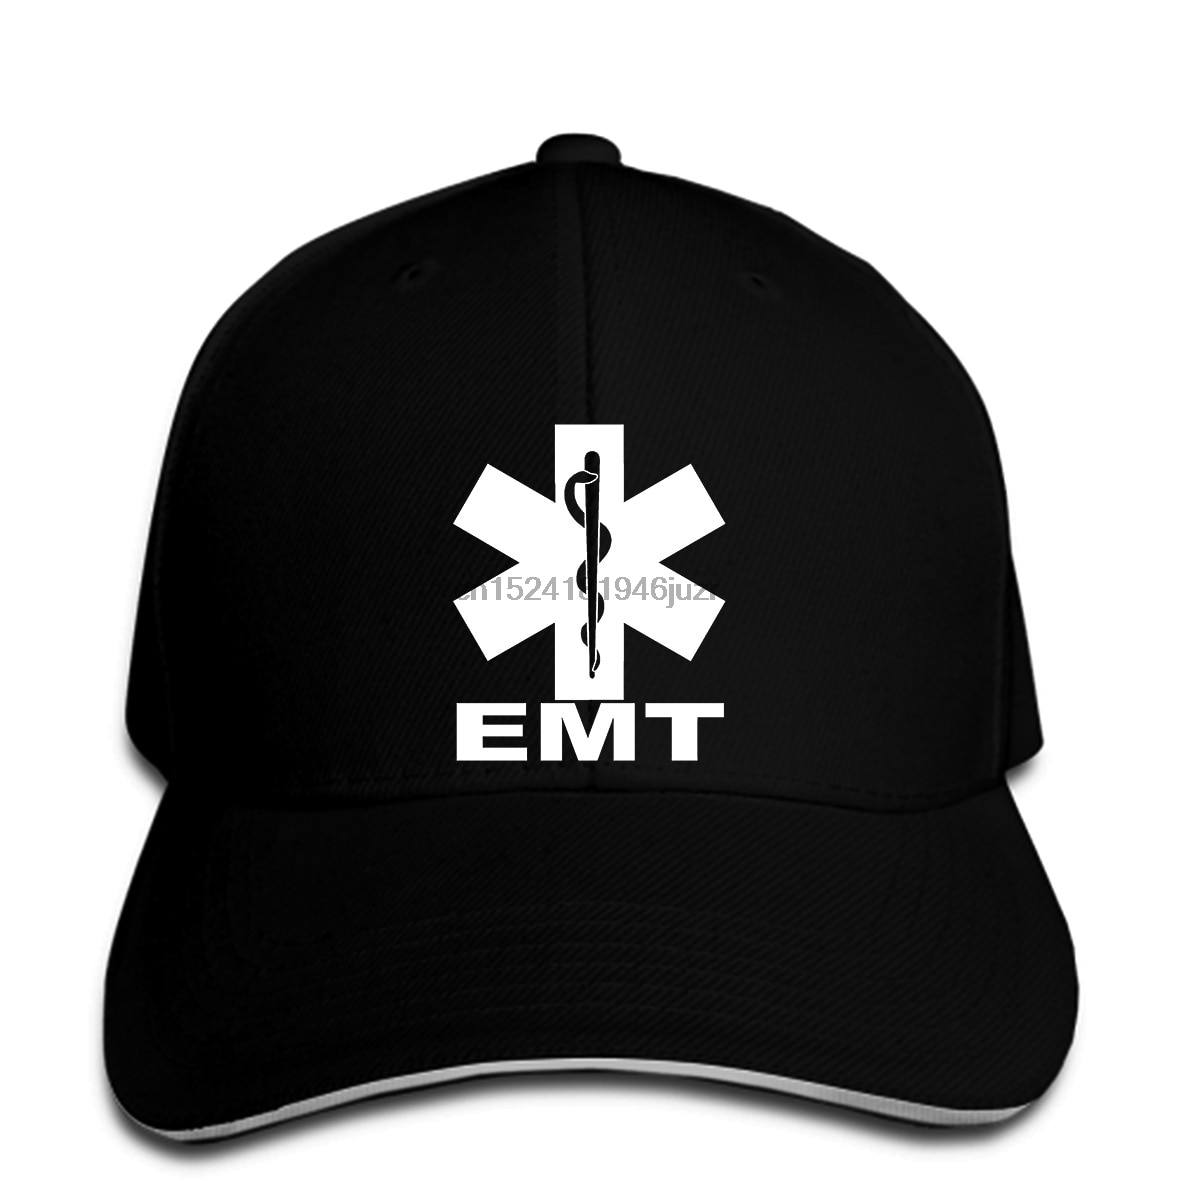 Gorras de béisbol de hip hop, EMT EMS, servicio médico de emergencia paramédico, Parte delantera trasera, snapback para hombres